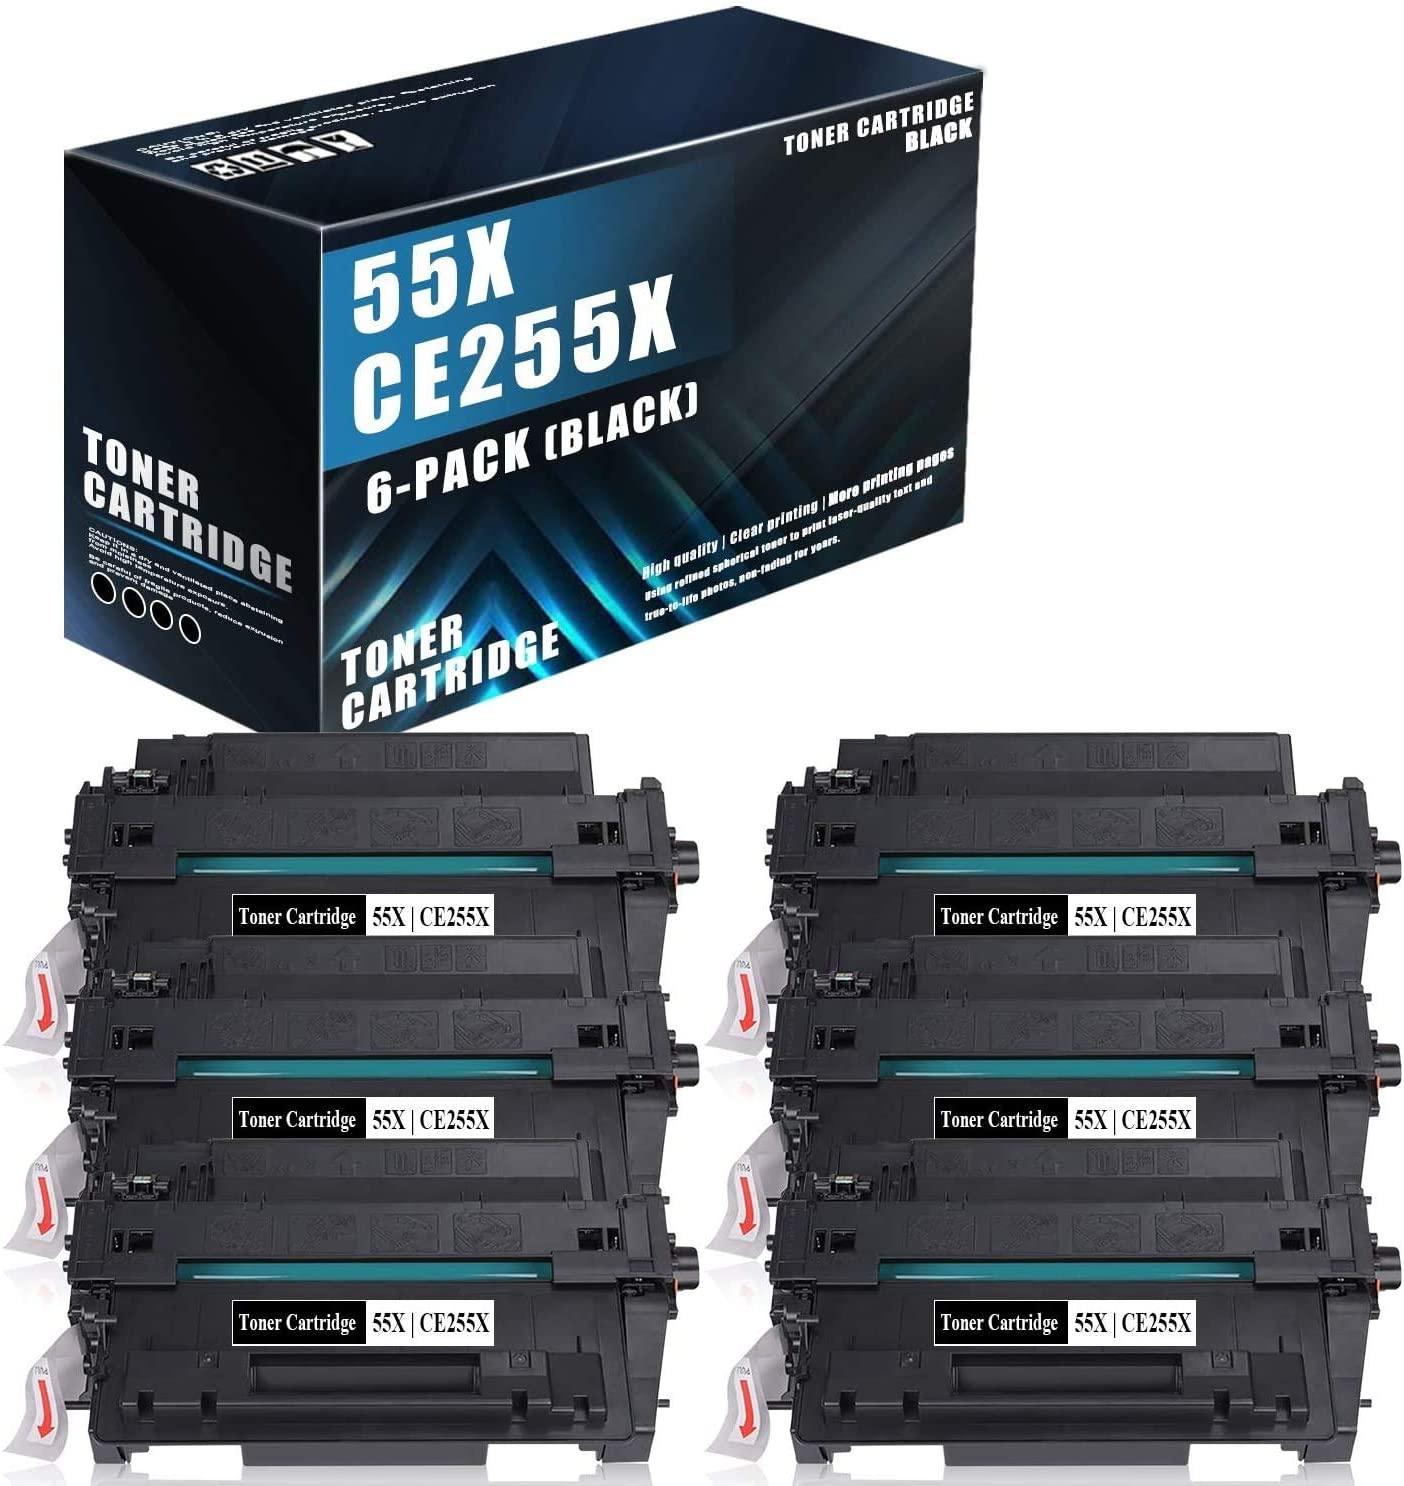 (6-Pack Set,Black) Compatible 55X | CE255X Toner Cartridge Replacement for HP Laserjet Pro MFP M521dn MFP M525dn MFP M525f MFP M525c P3015 P3015n P3015dn P3015x Printers,Sold by MonInk